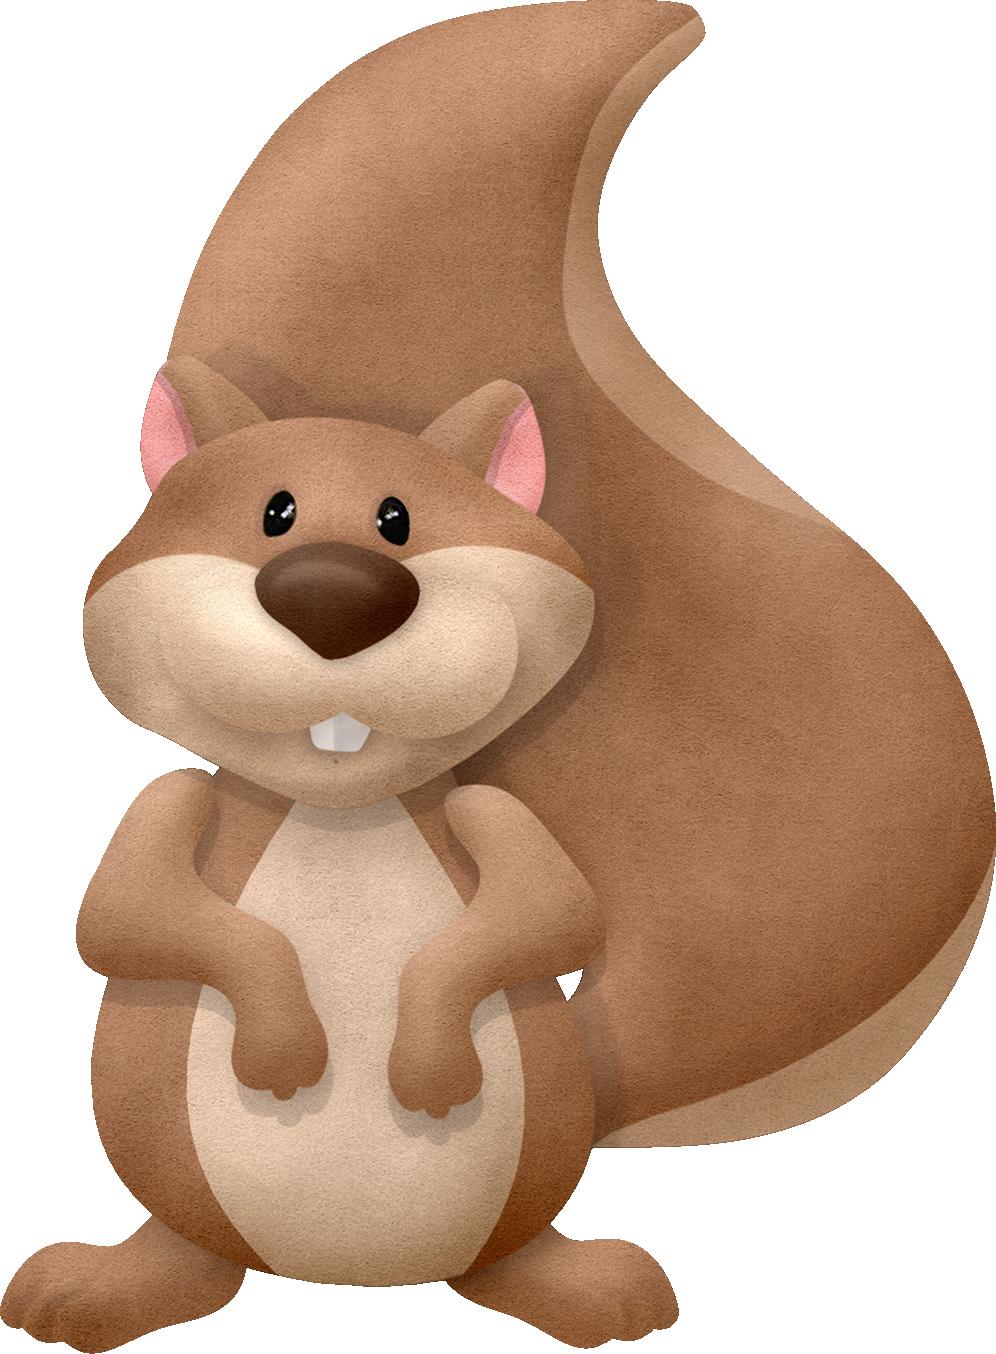 Woodland clipart beaver. Squirrel maryfran png clip